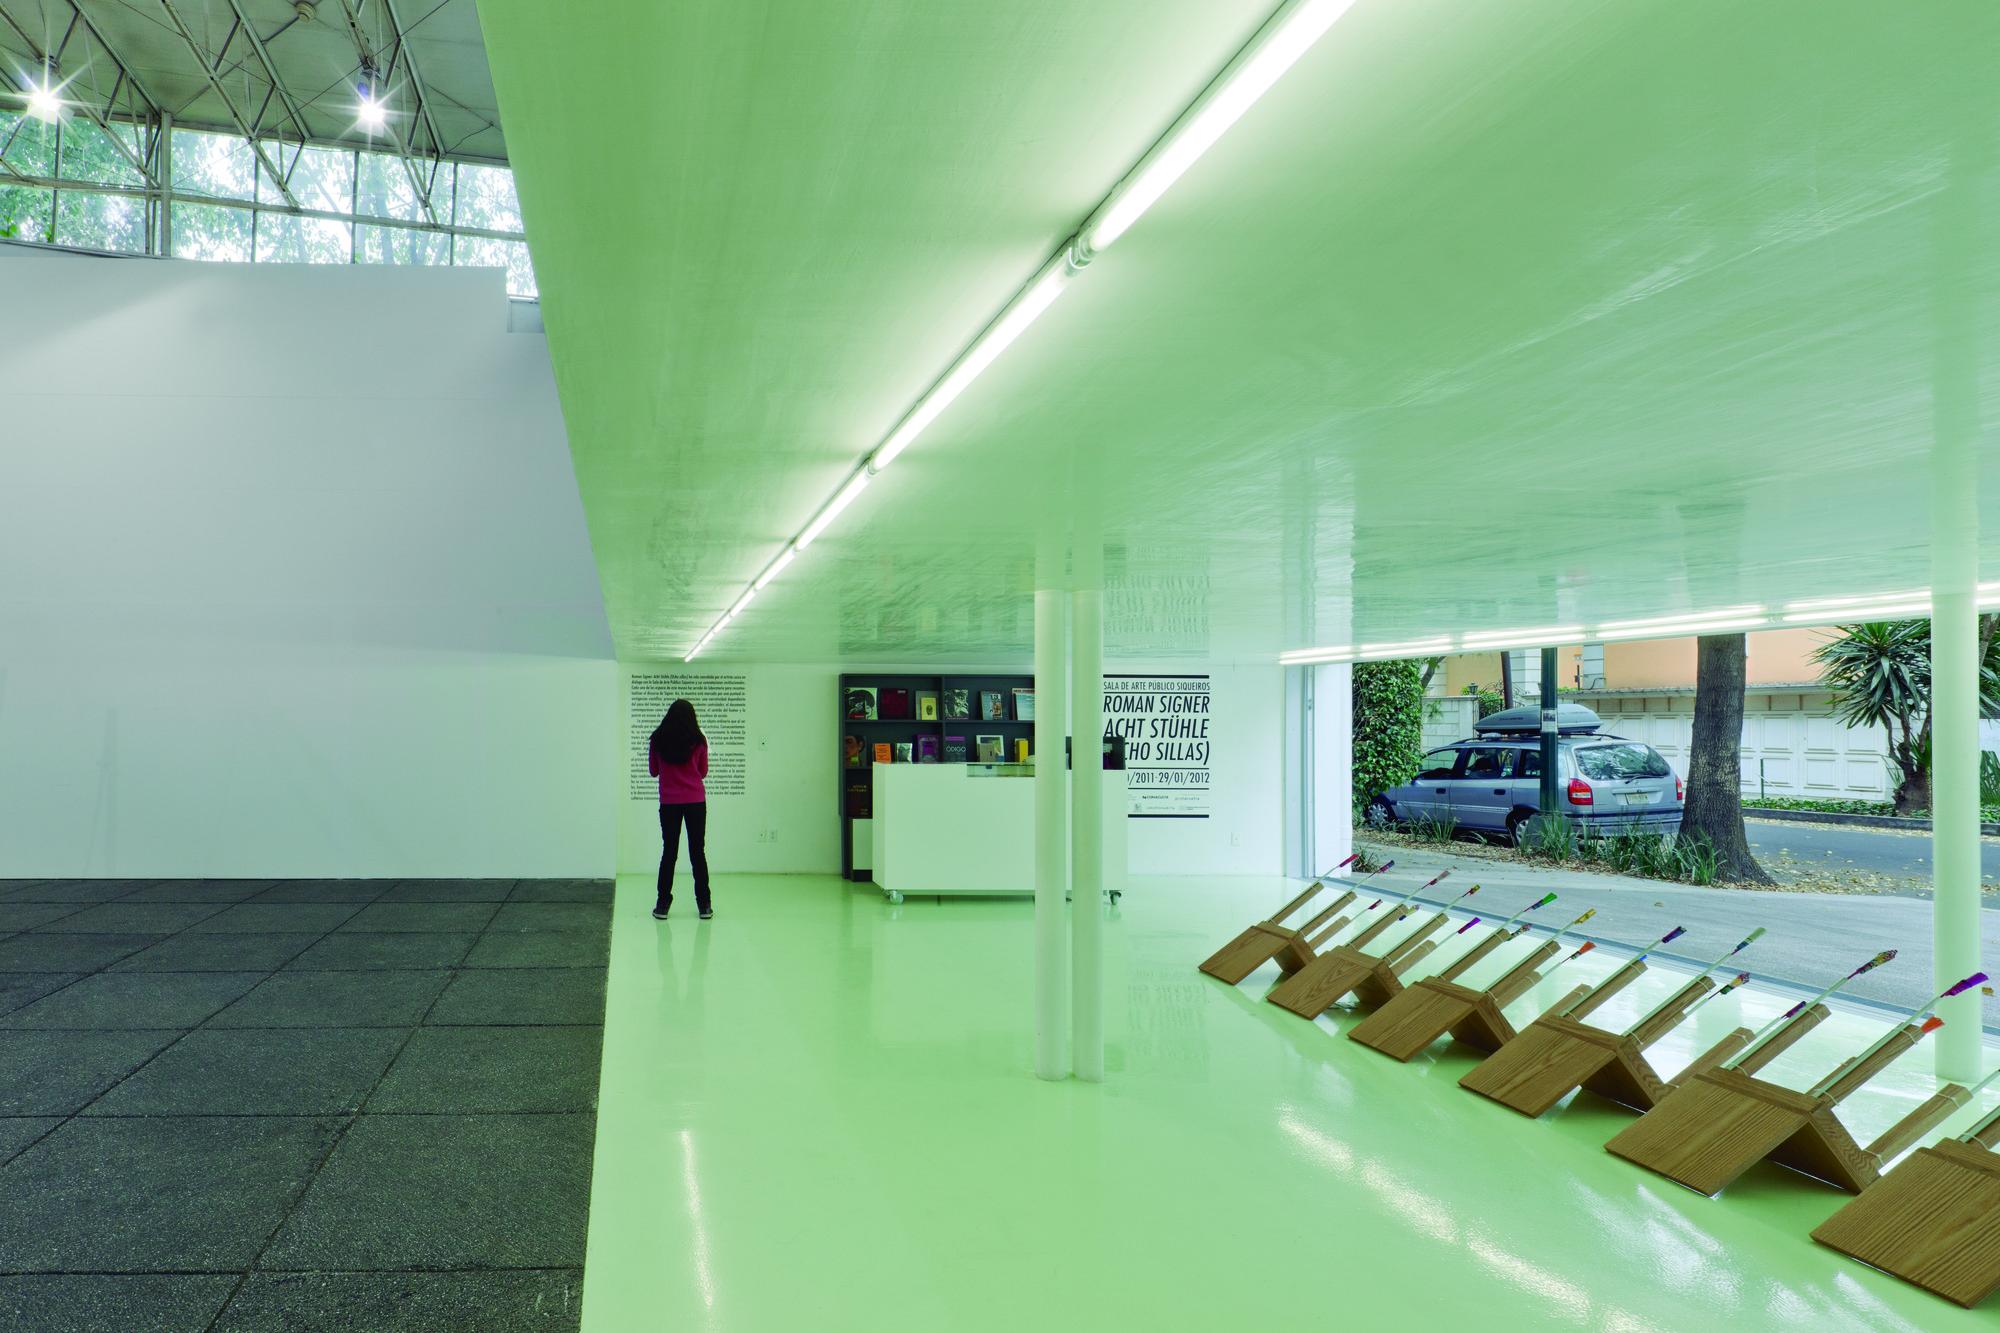 Siqueiros Public Art Gallery / arquitectura 911sc + Esrawe, © Rafael Gamo